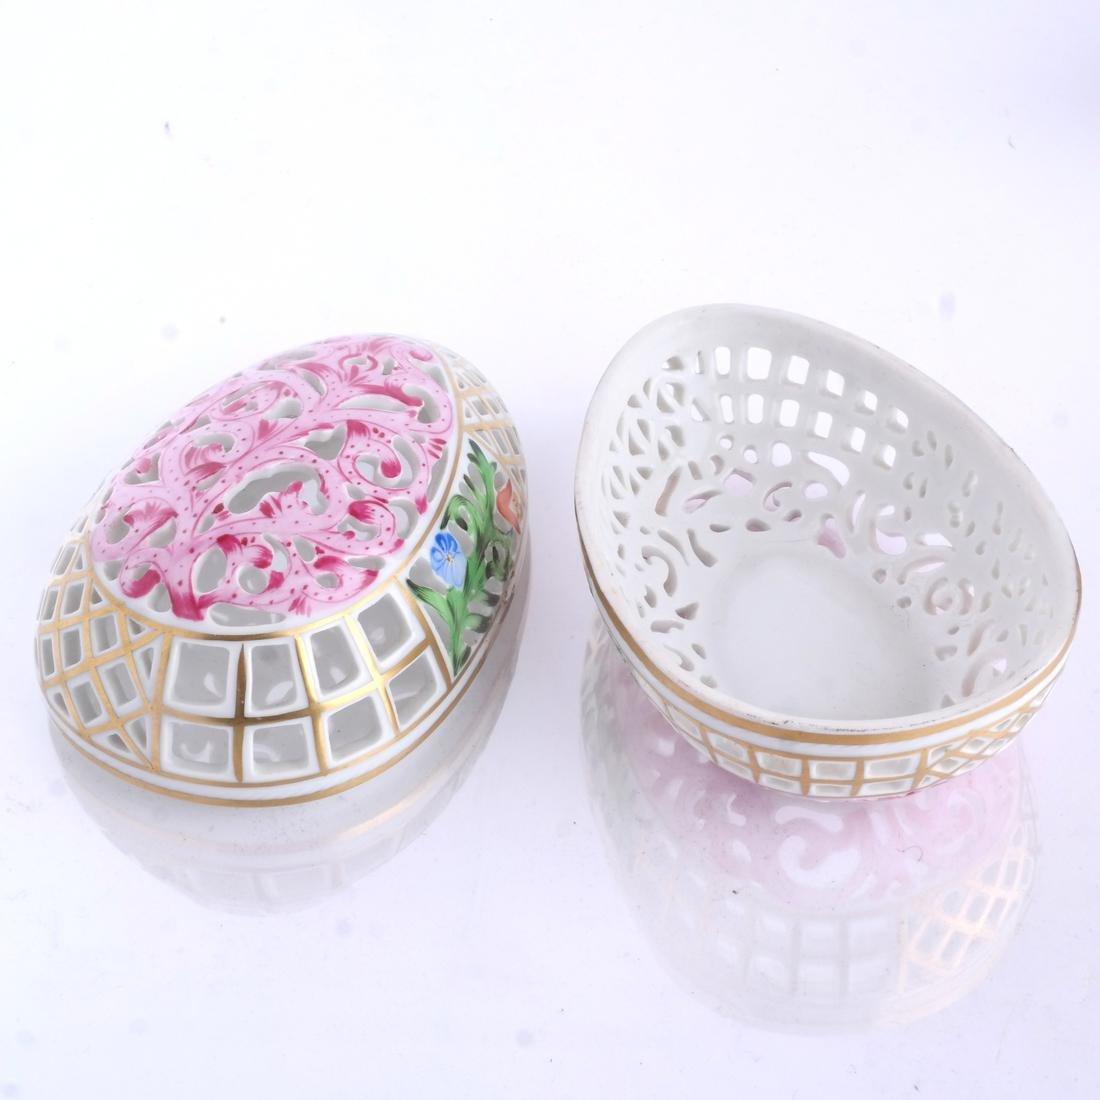 Herend Porcelain Decorative Articles - 5